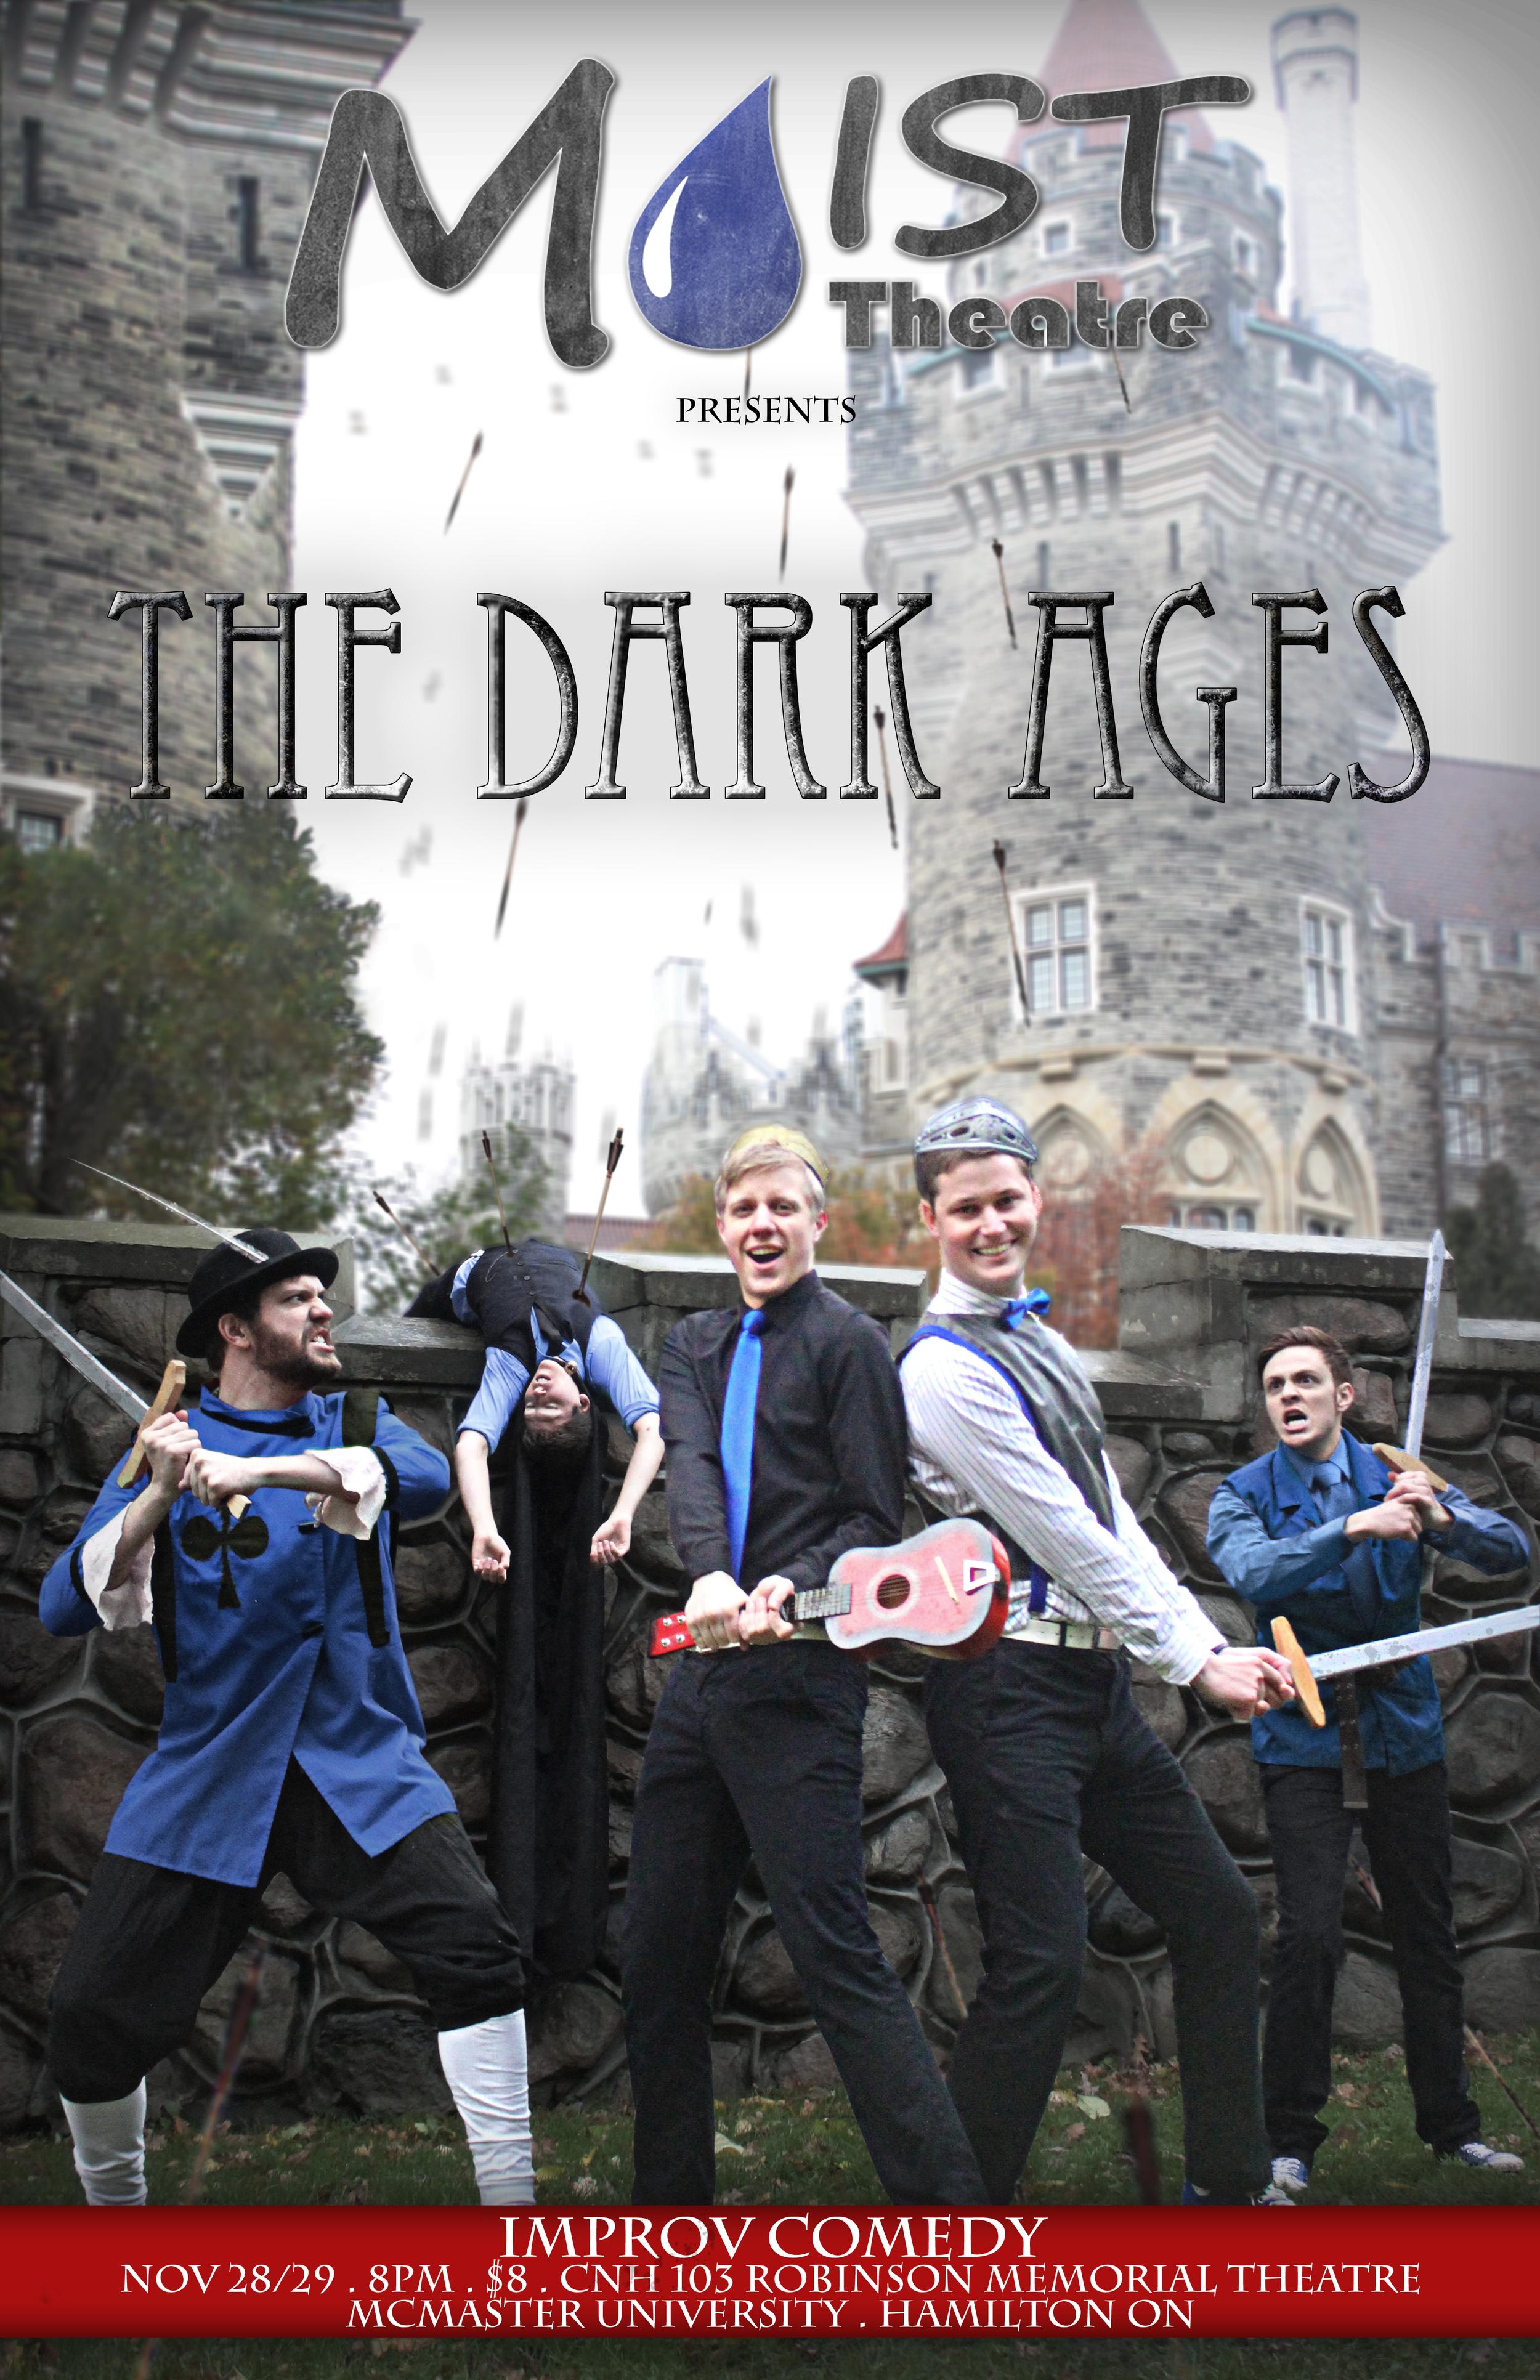 Moist Theatre Presents The Dark Ages Full Poster.jpg